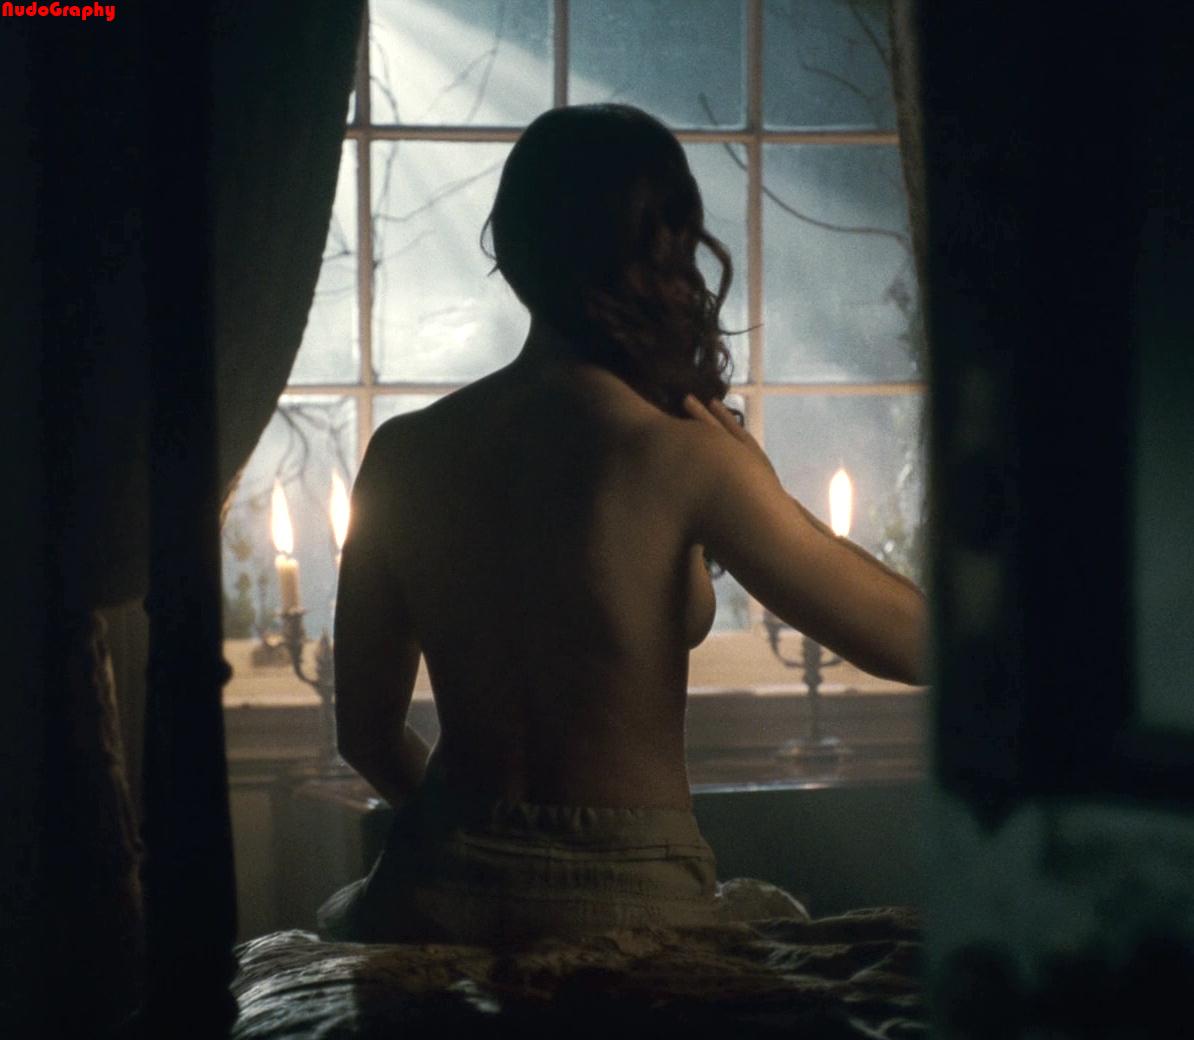 Wolfman sex videa sex gallery